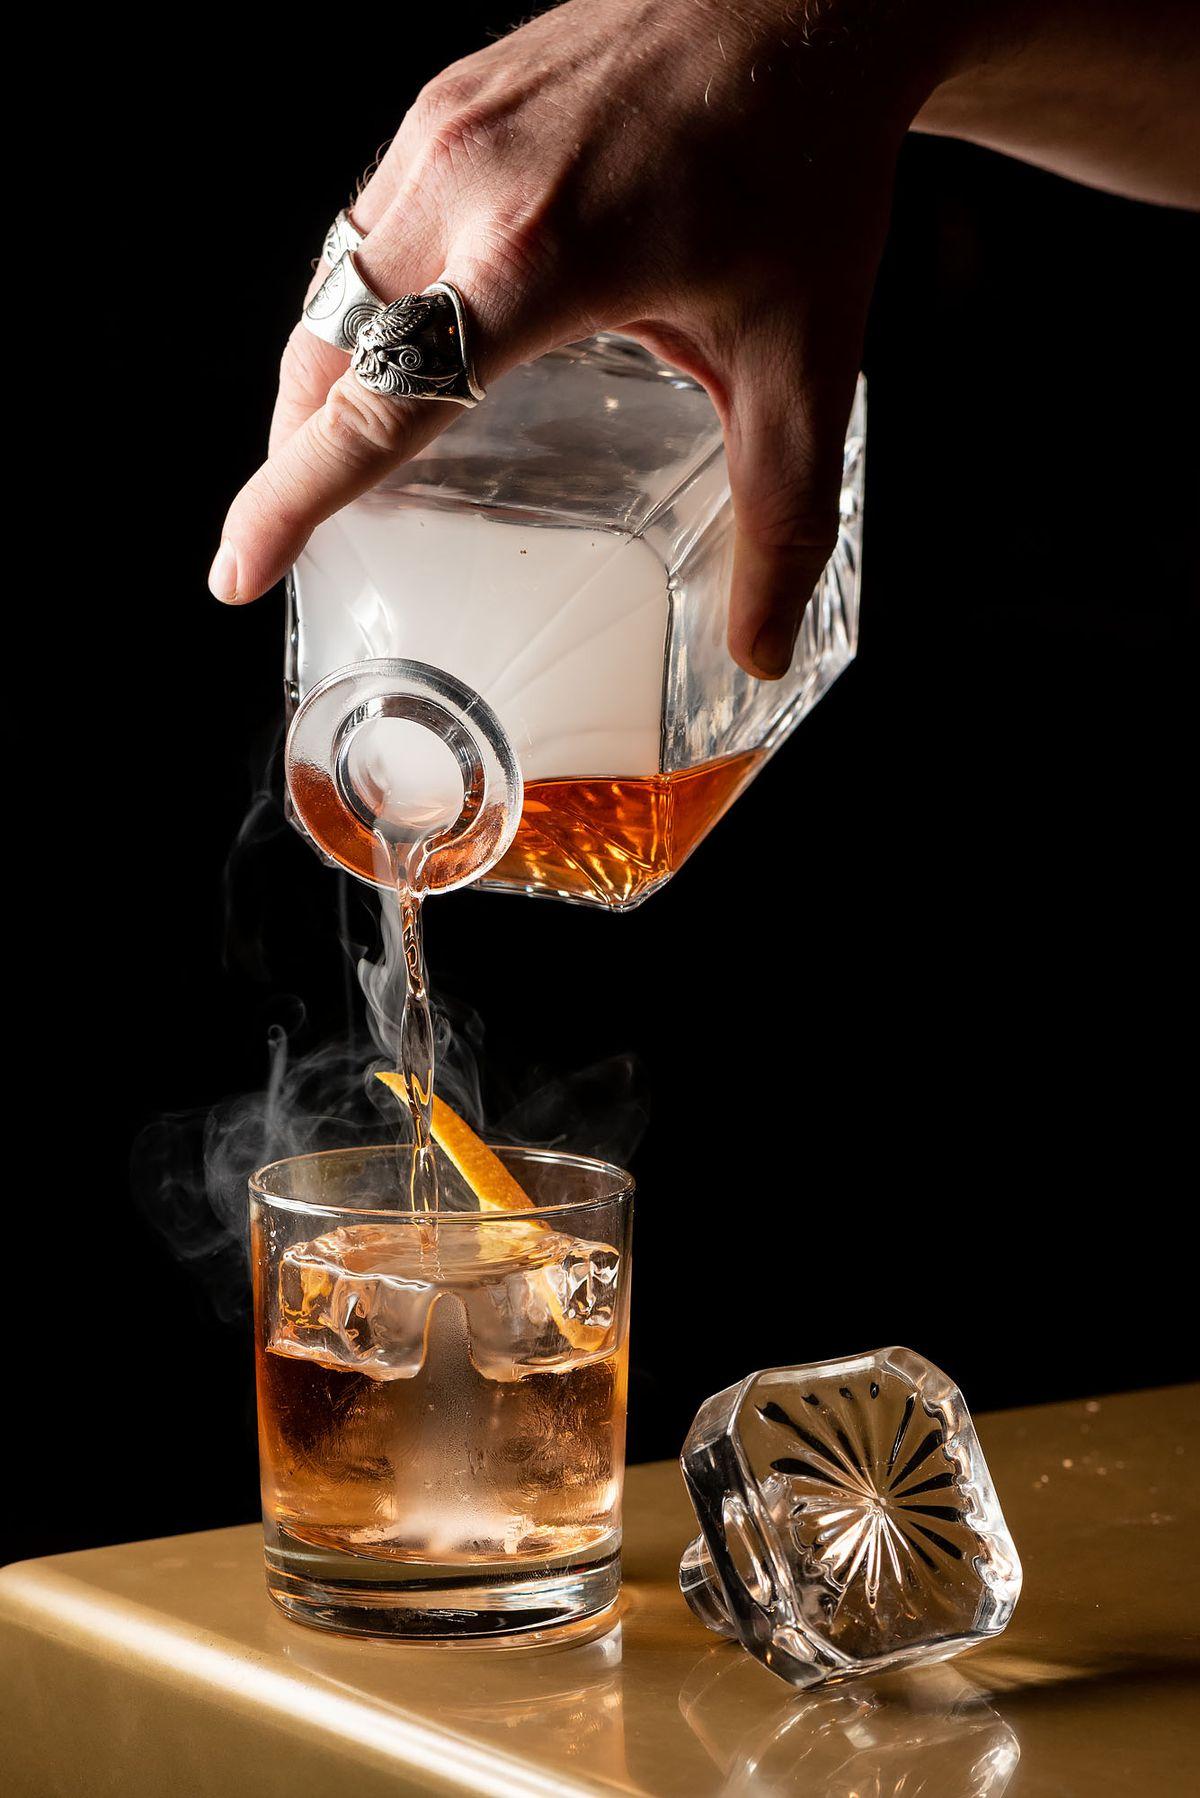 mixtape pouring smoke cocktail glass table